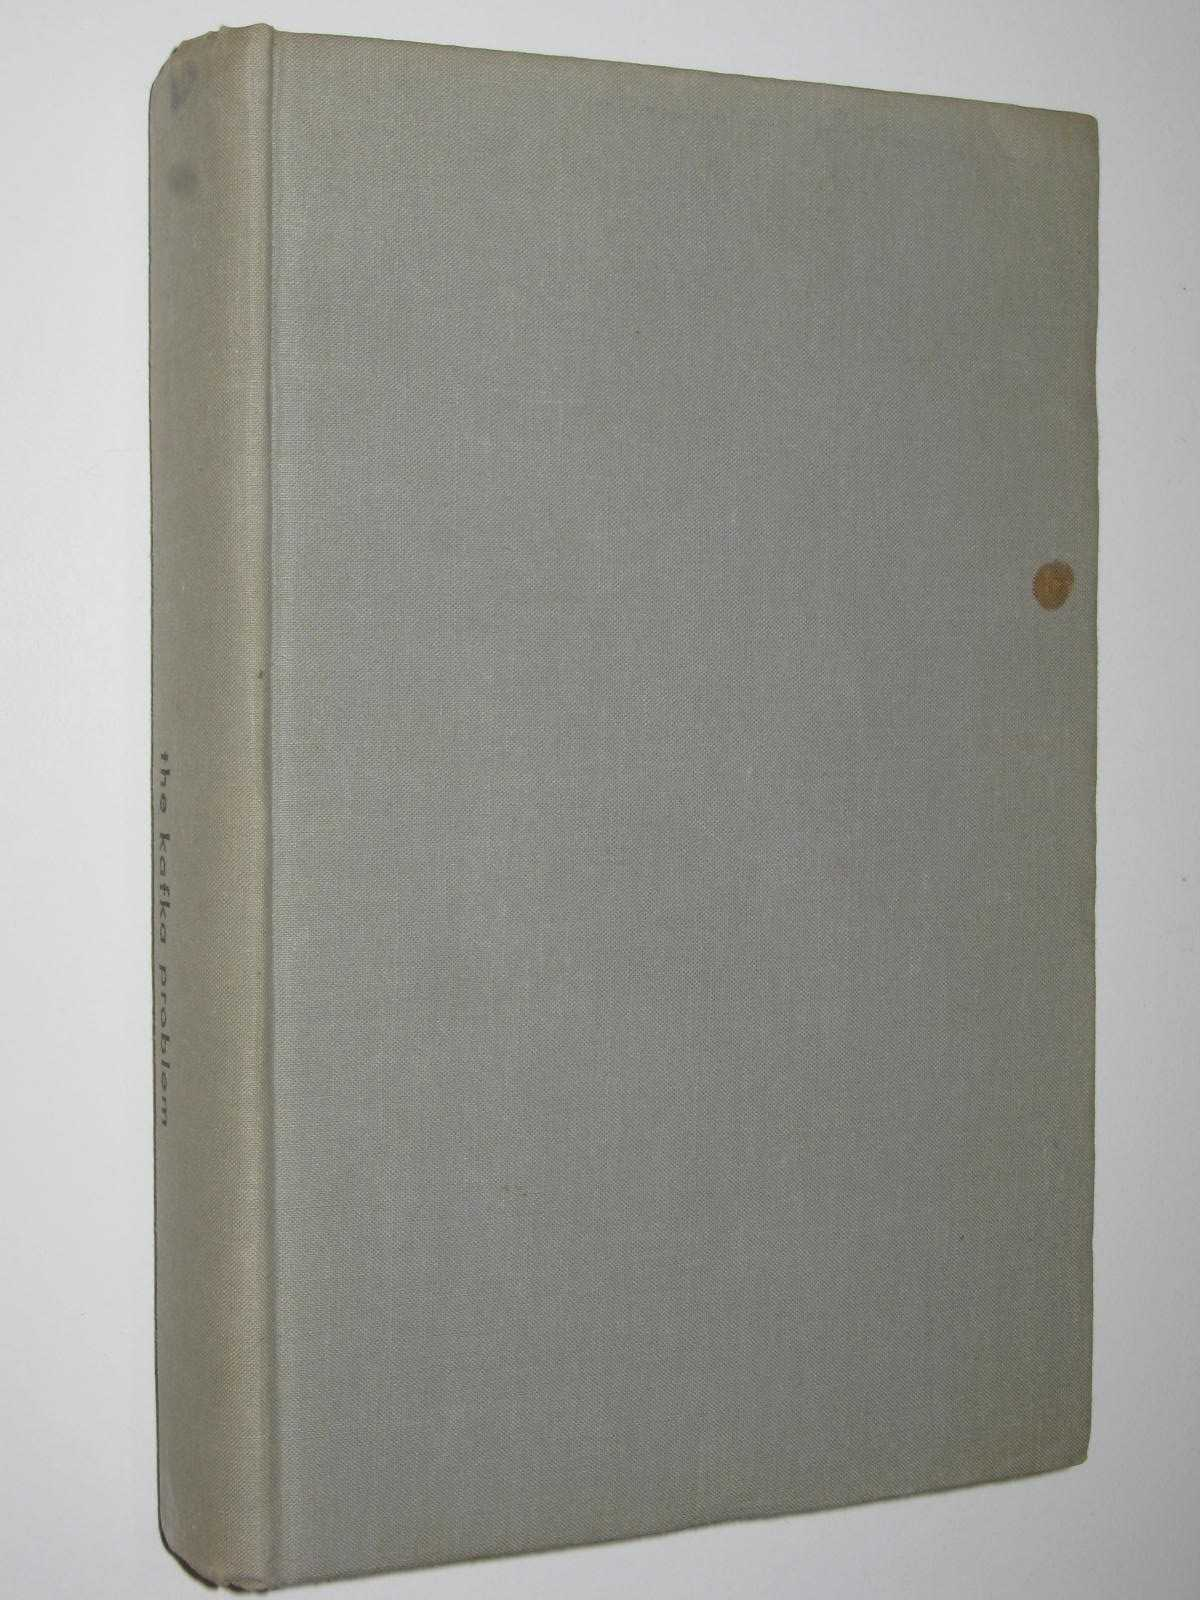 Image for The Kafka Problem : An Anthology of Criticism About Franz Kafka.